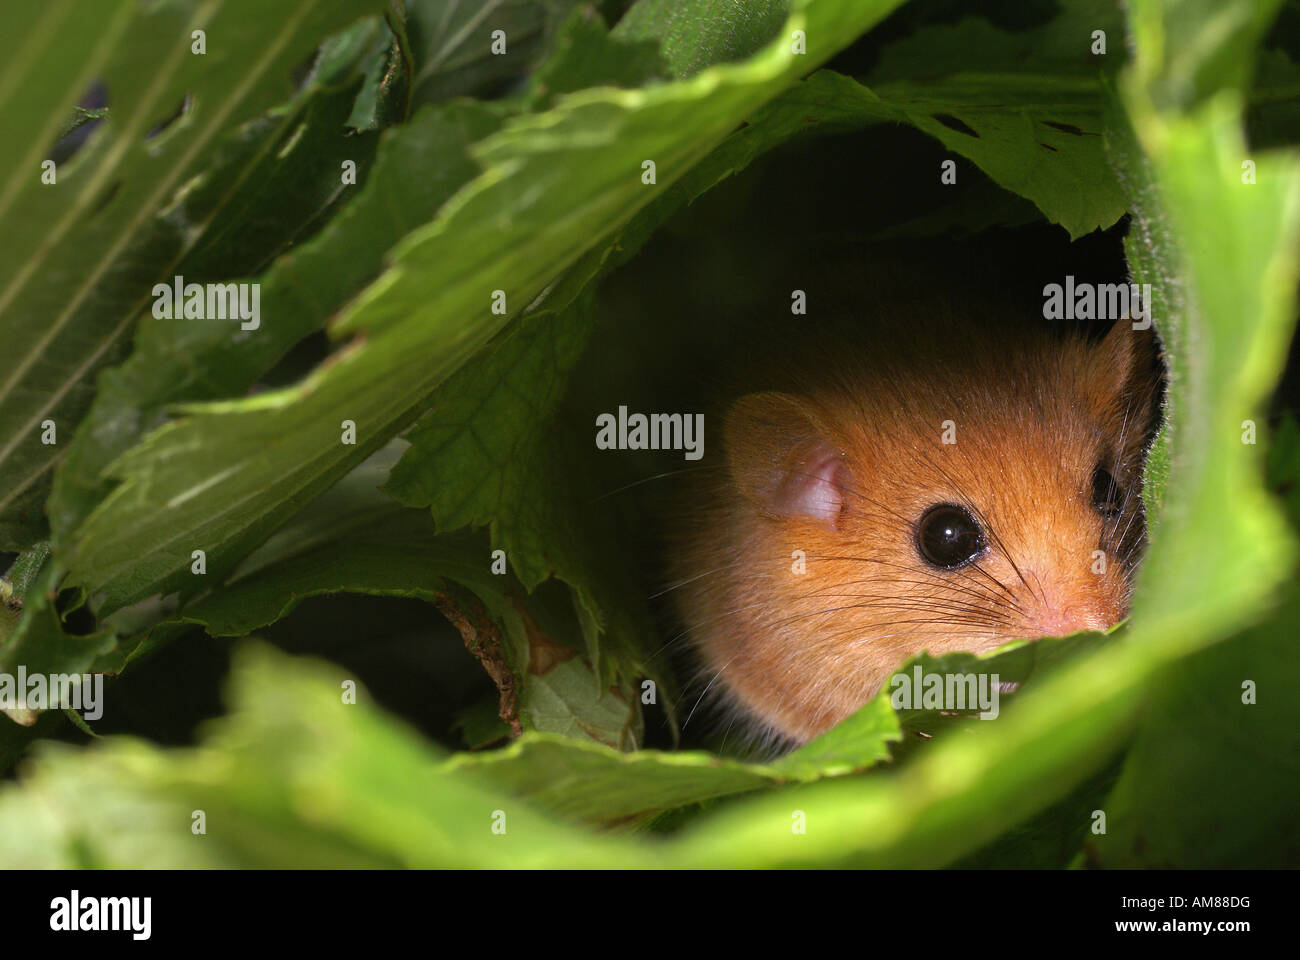 Hazel dormouse (Muscardinus avellanarius) - Stock Image